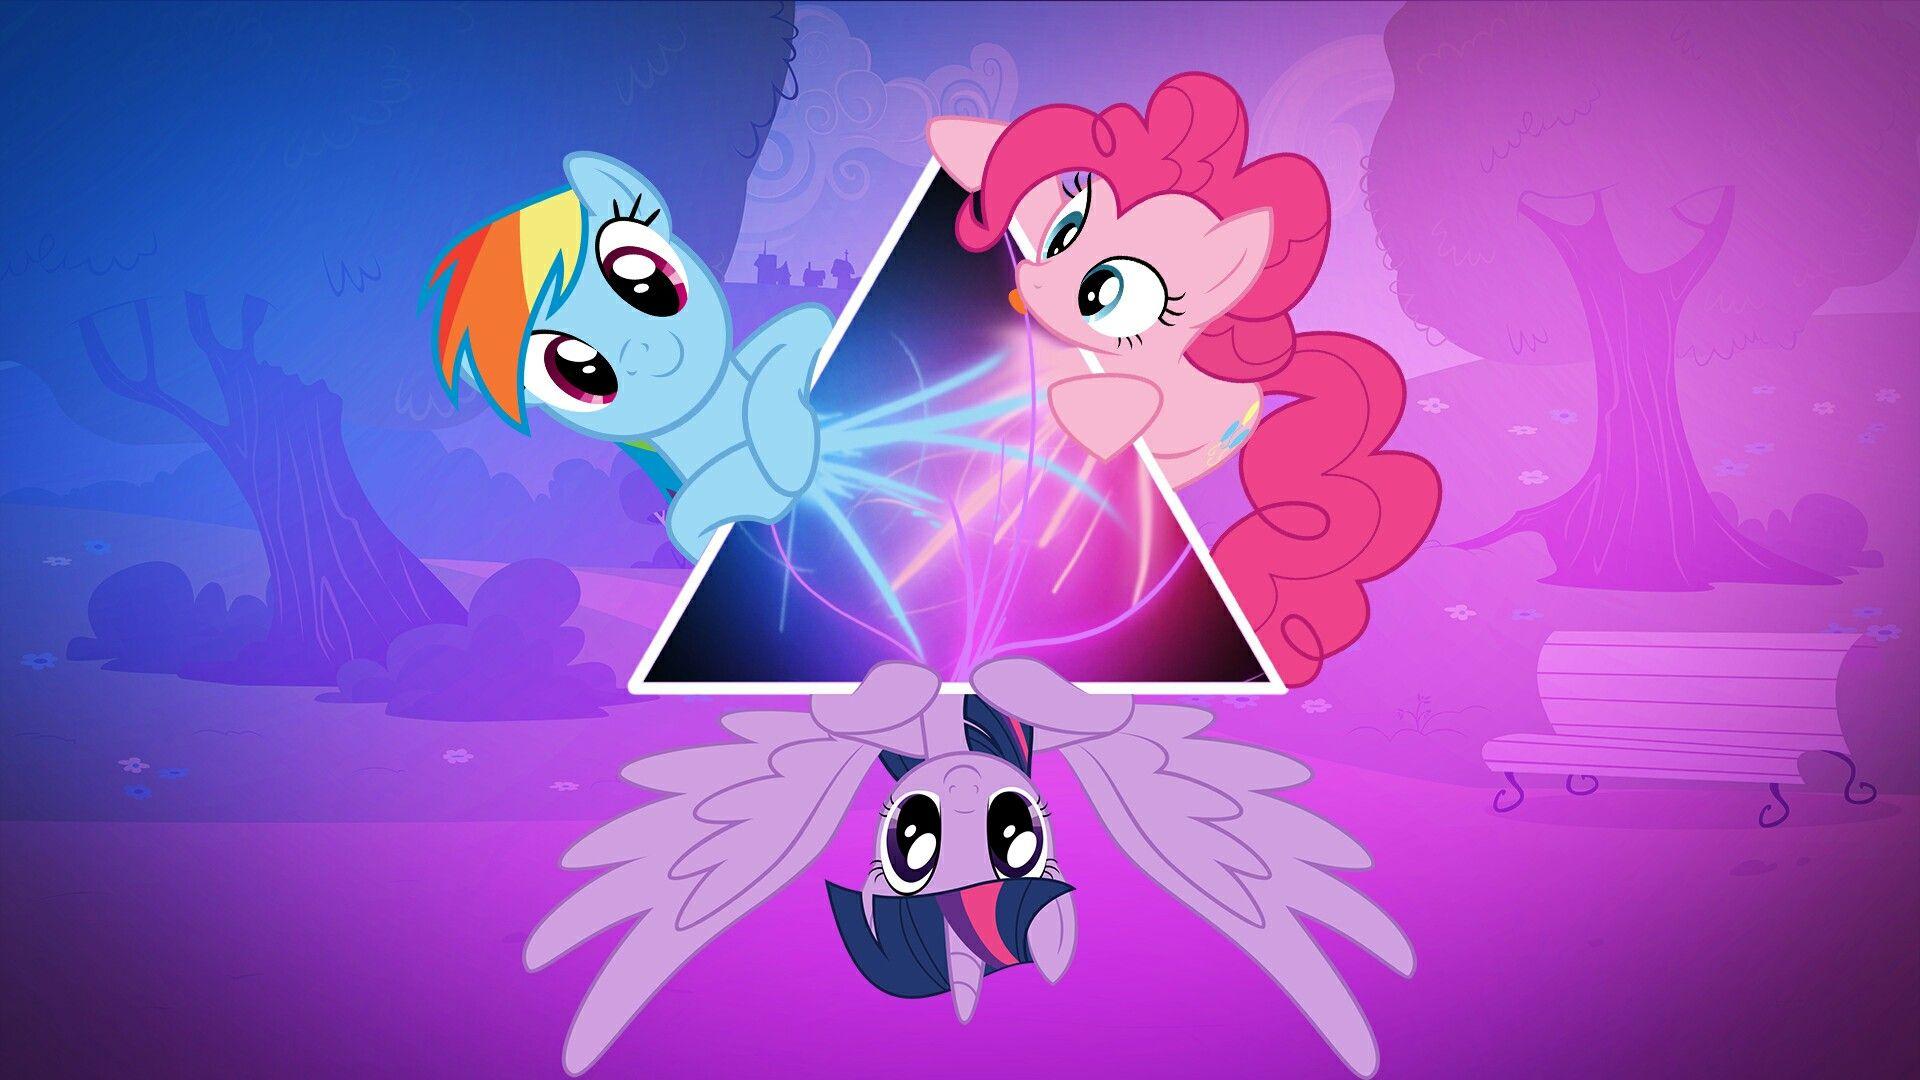 - Rainbow Dash, Pinkie Pie, Twilight Sparkle (With Images